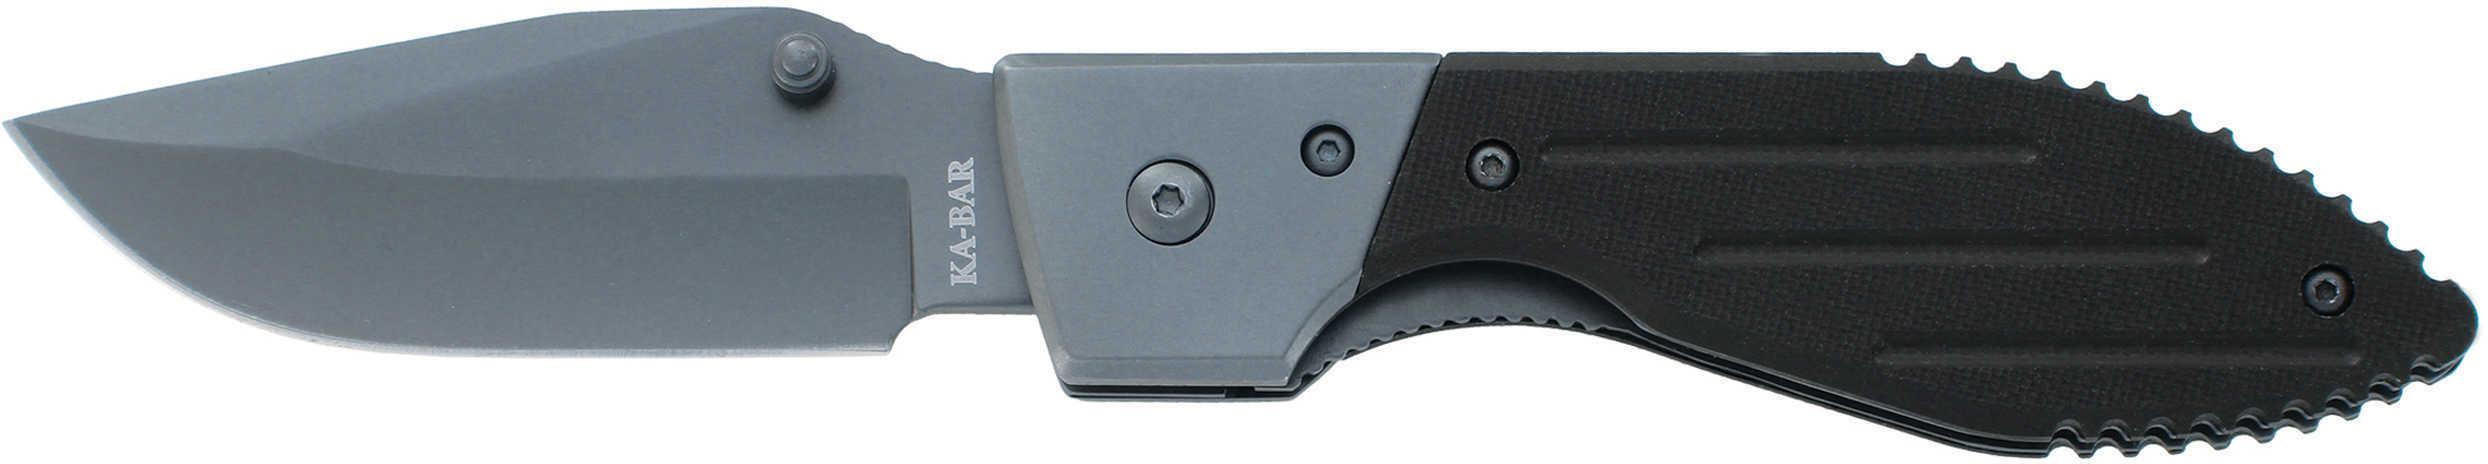 Ka-Bar Warthog Folder II, Straight Edge Md: 3072